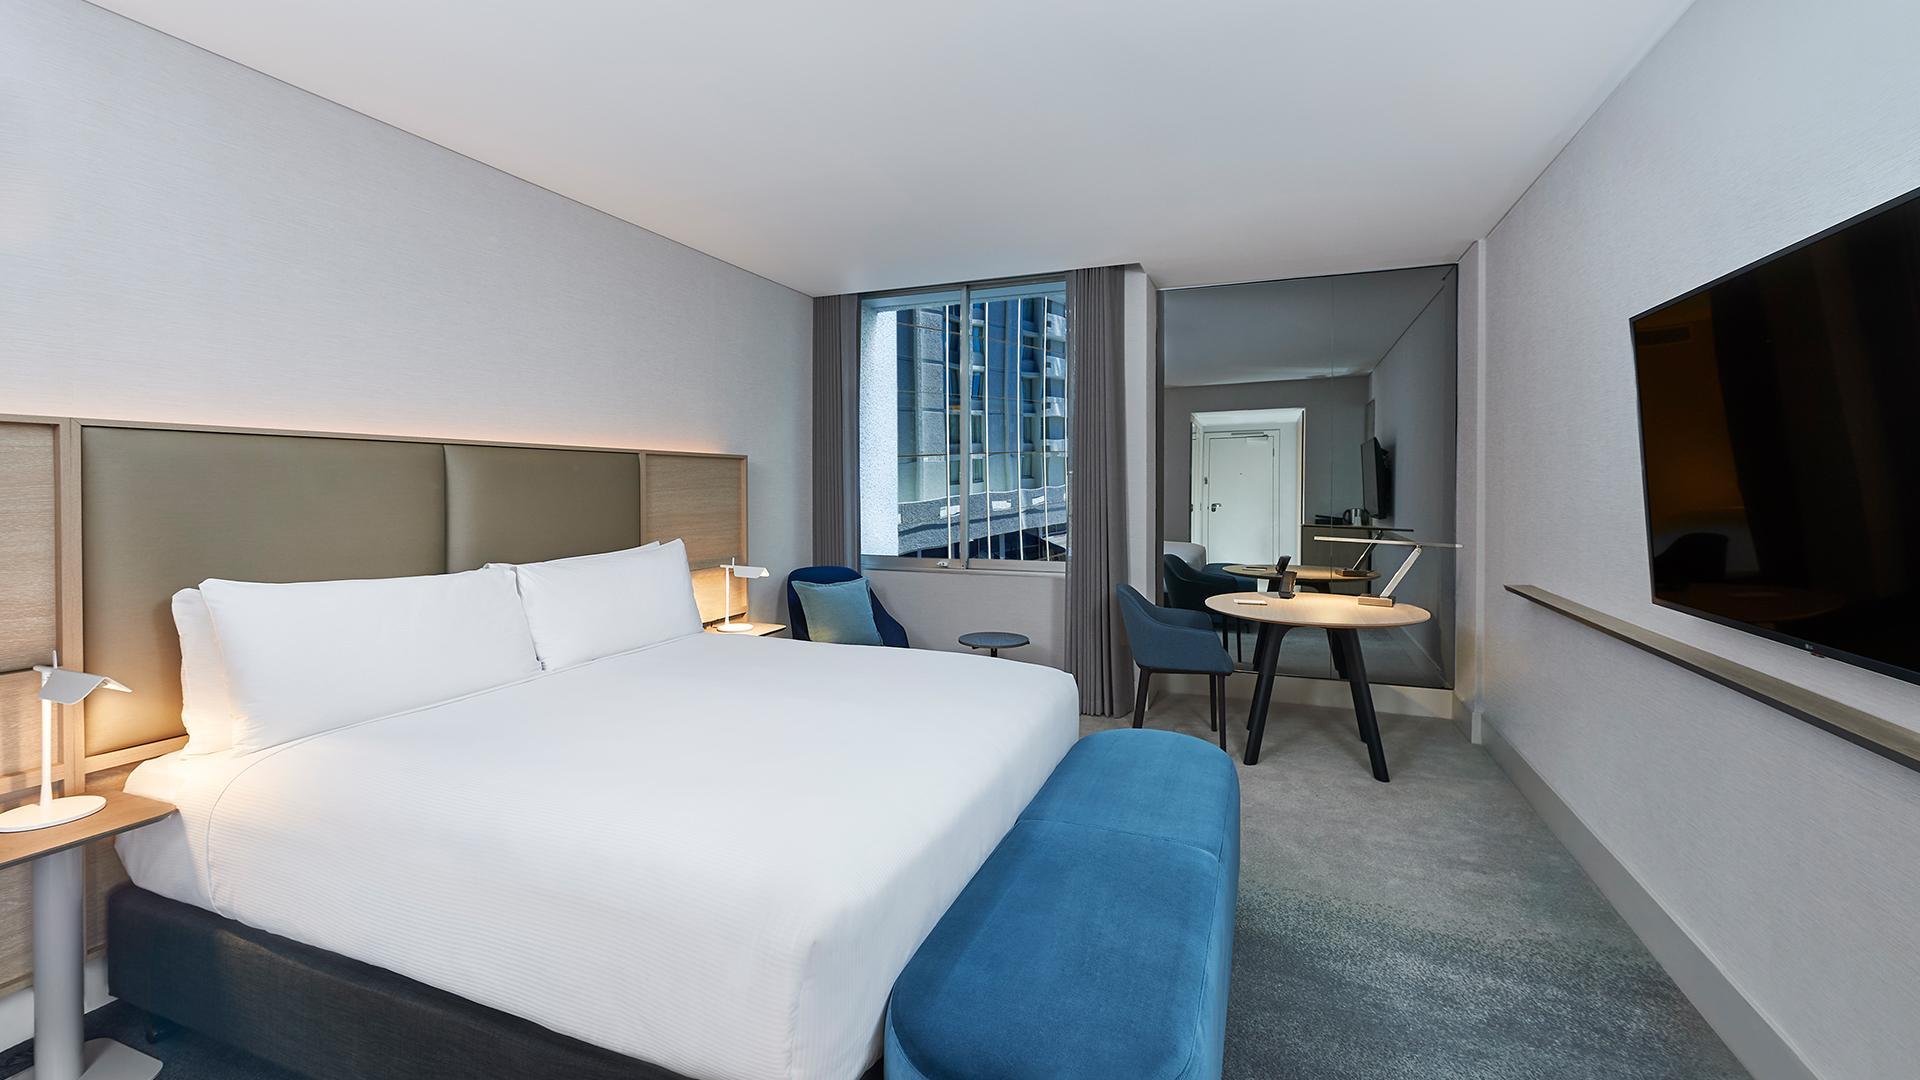 Executive King Room image 1 at Parmelia Hilton Perth by City of Perth, Western Australia, Australia